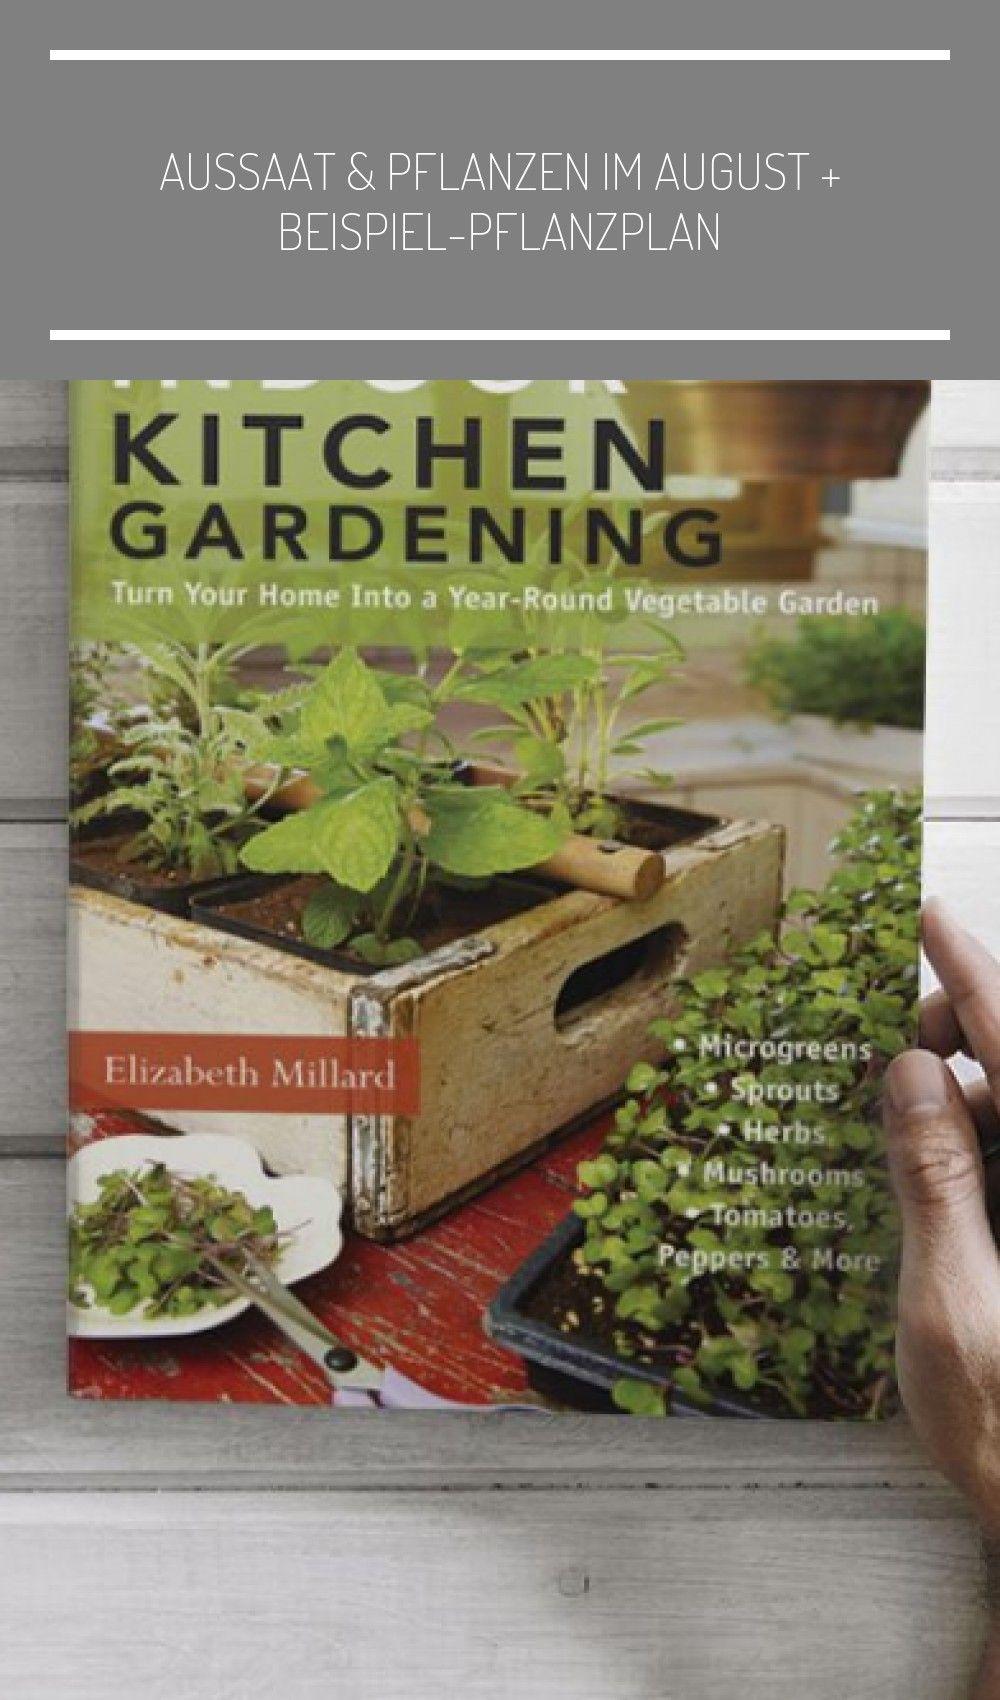 bda25209692c0405637e4c35ab4849d3 - The Year Round Vegetable Gardener Pdf